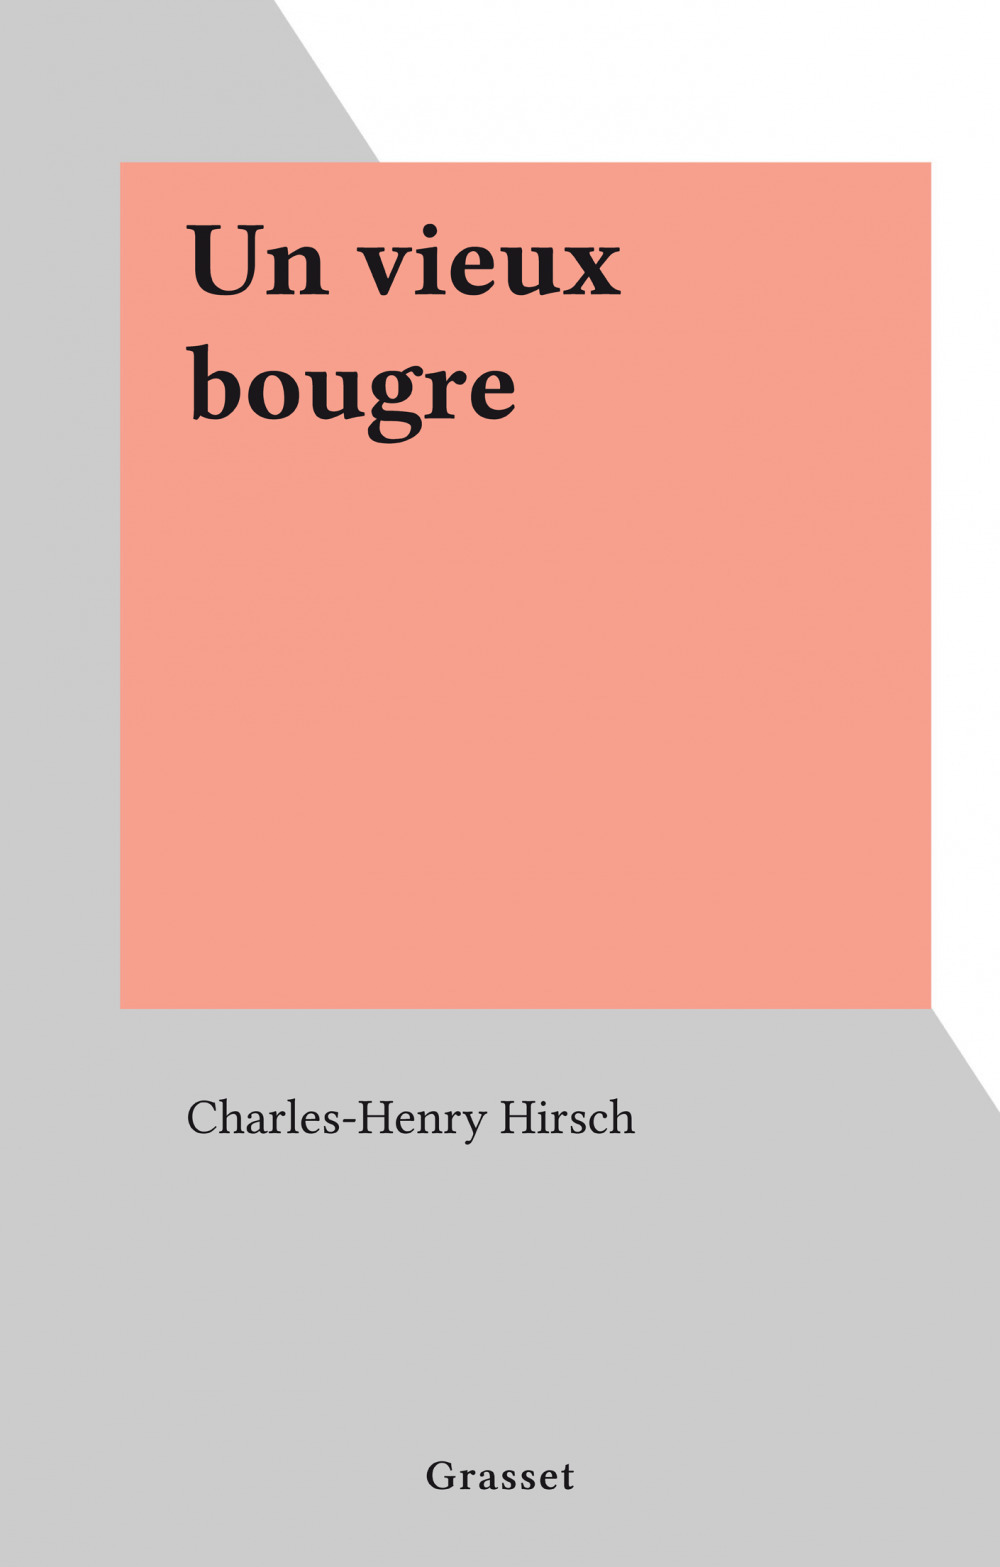 Un vieux bougre  - Charles-Henry Hirsch